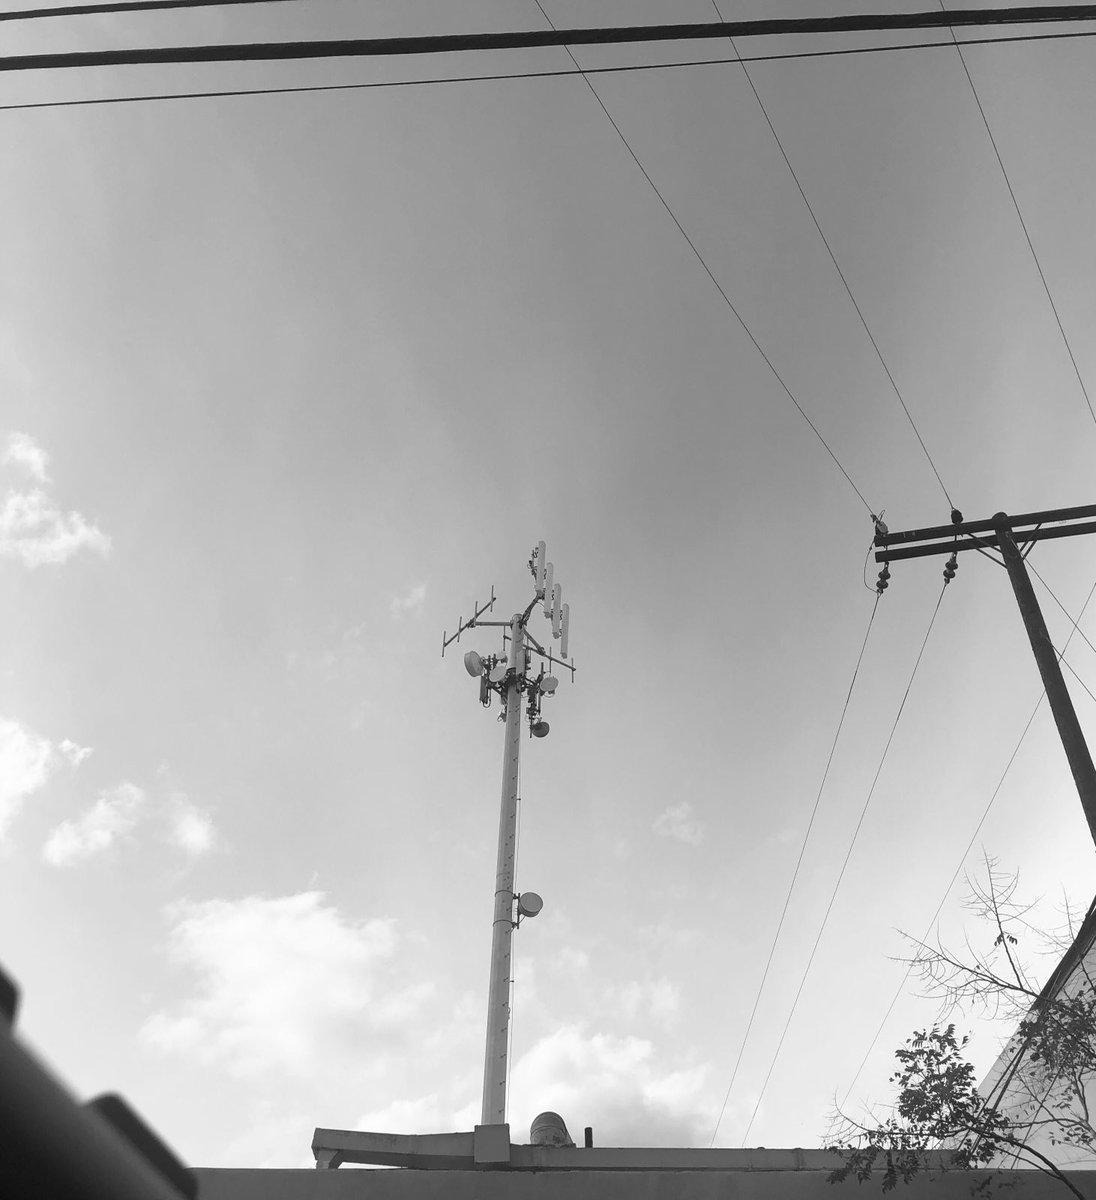 #Sunroof shot. #Wednesday #Downey #California #WednesdayMotivation #WednesdayMood #sky #PowerLines #Electricity #January #January2021 #picture #Tower #photography #phone #photo